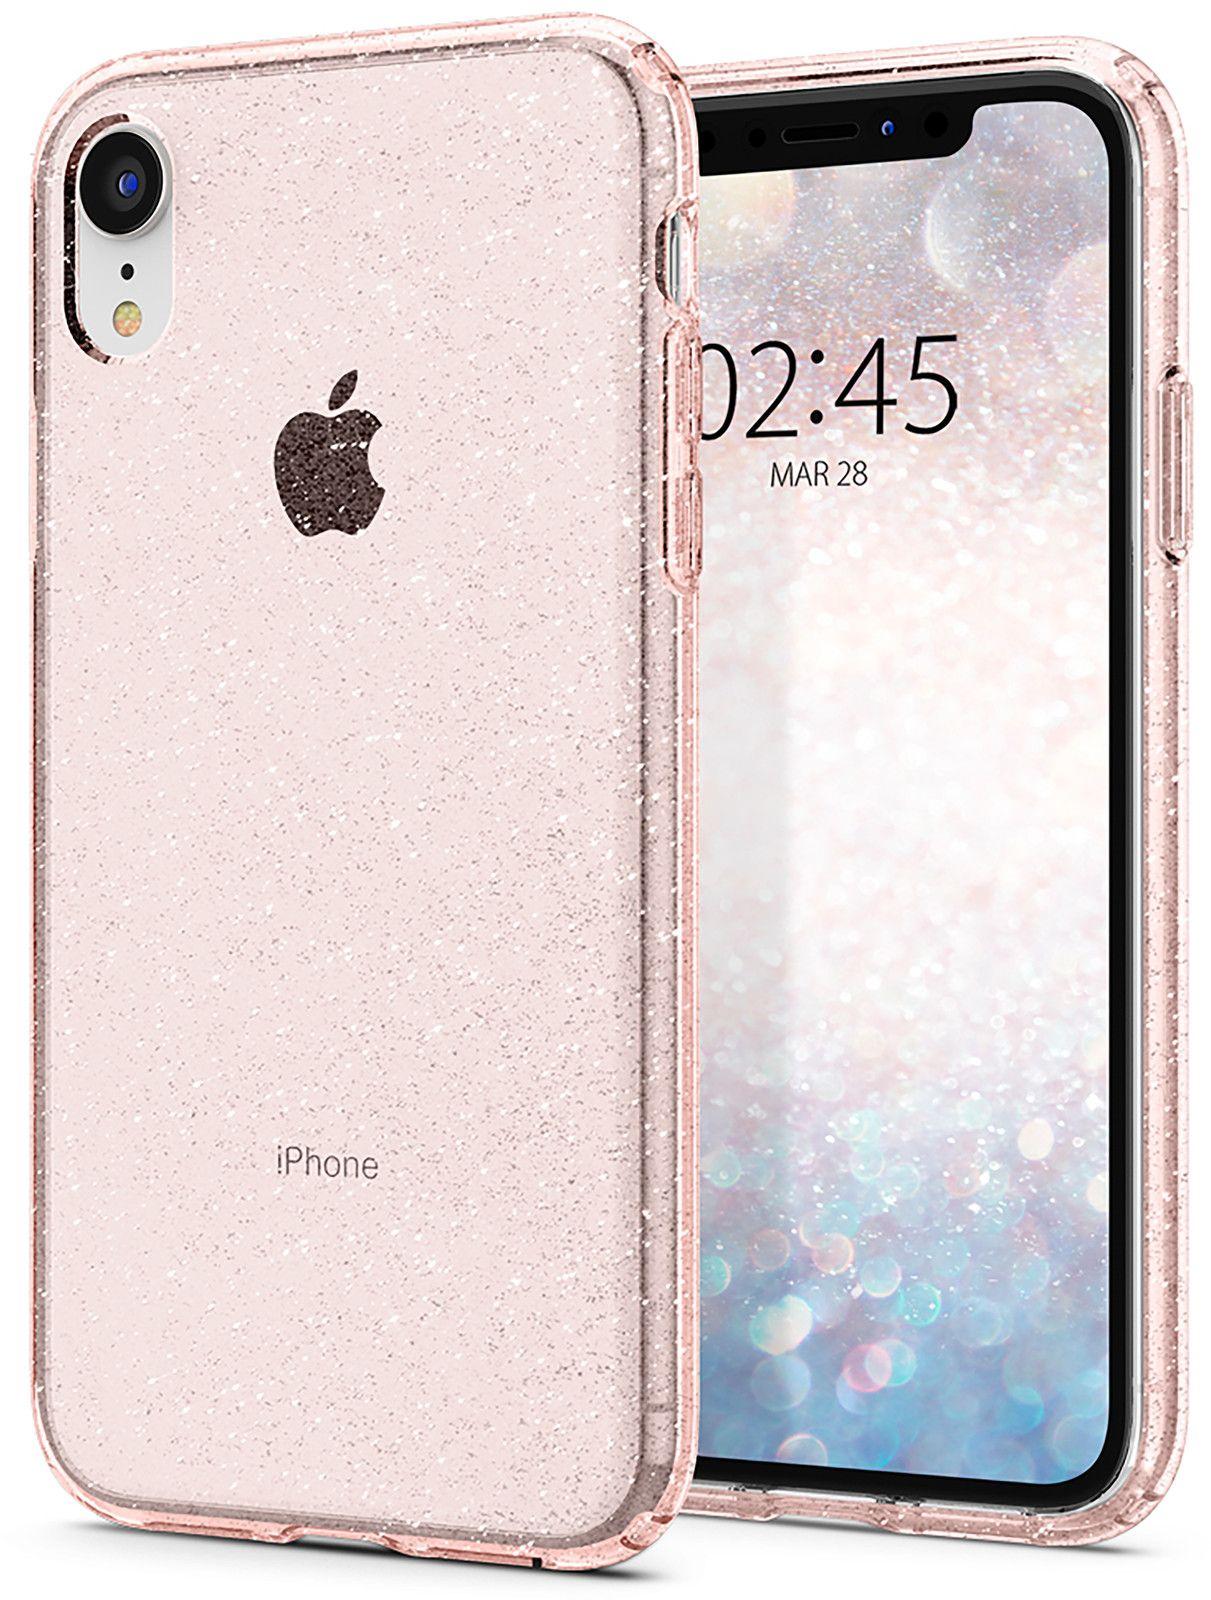 Spigen Liquid Crystal Glitter (iPhone Xr) - Transparent